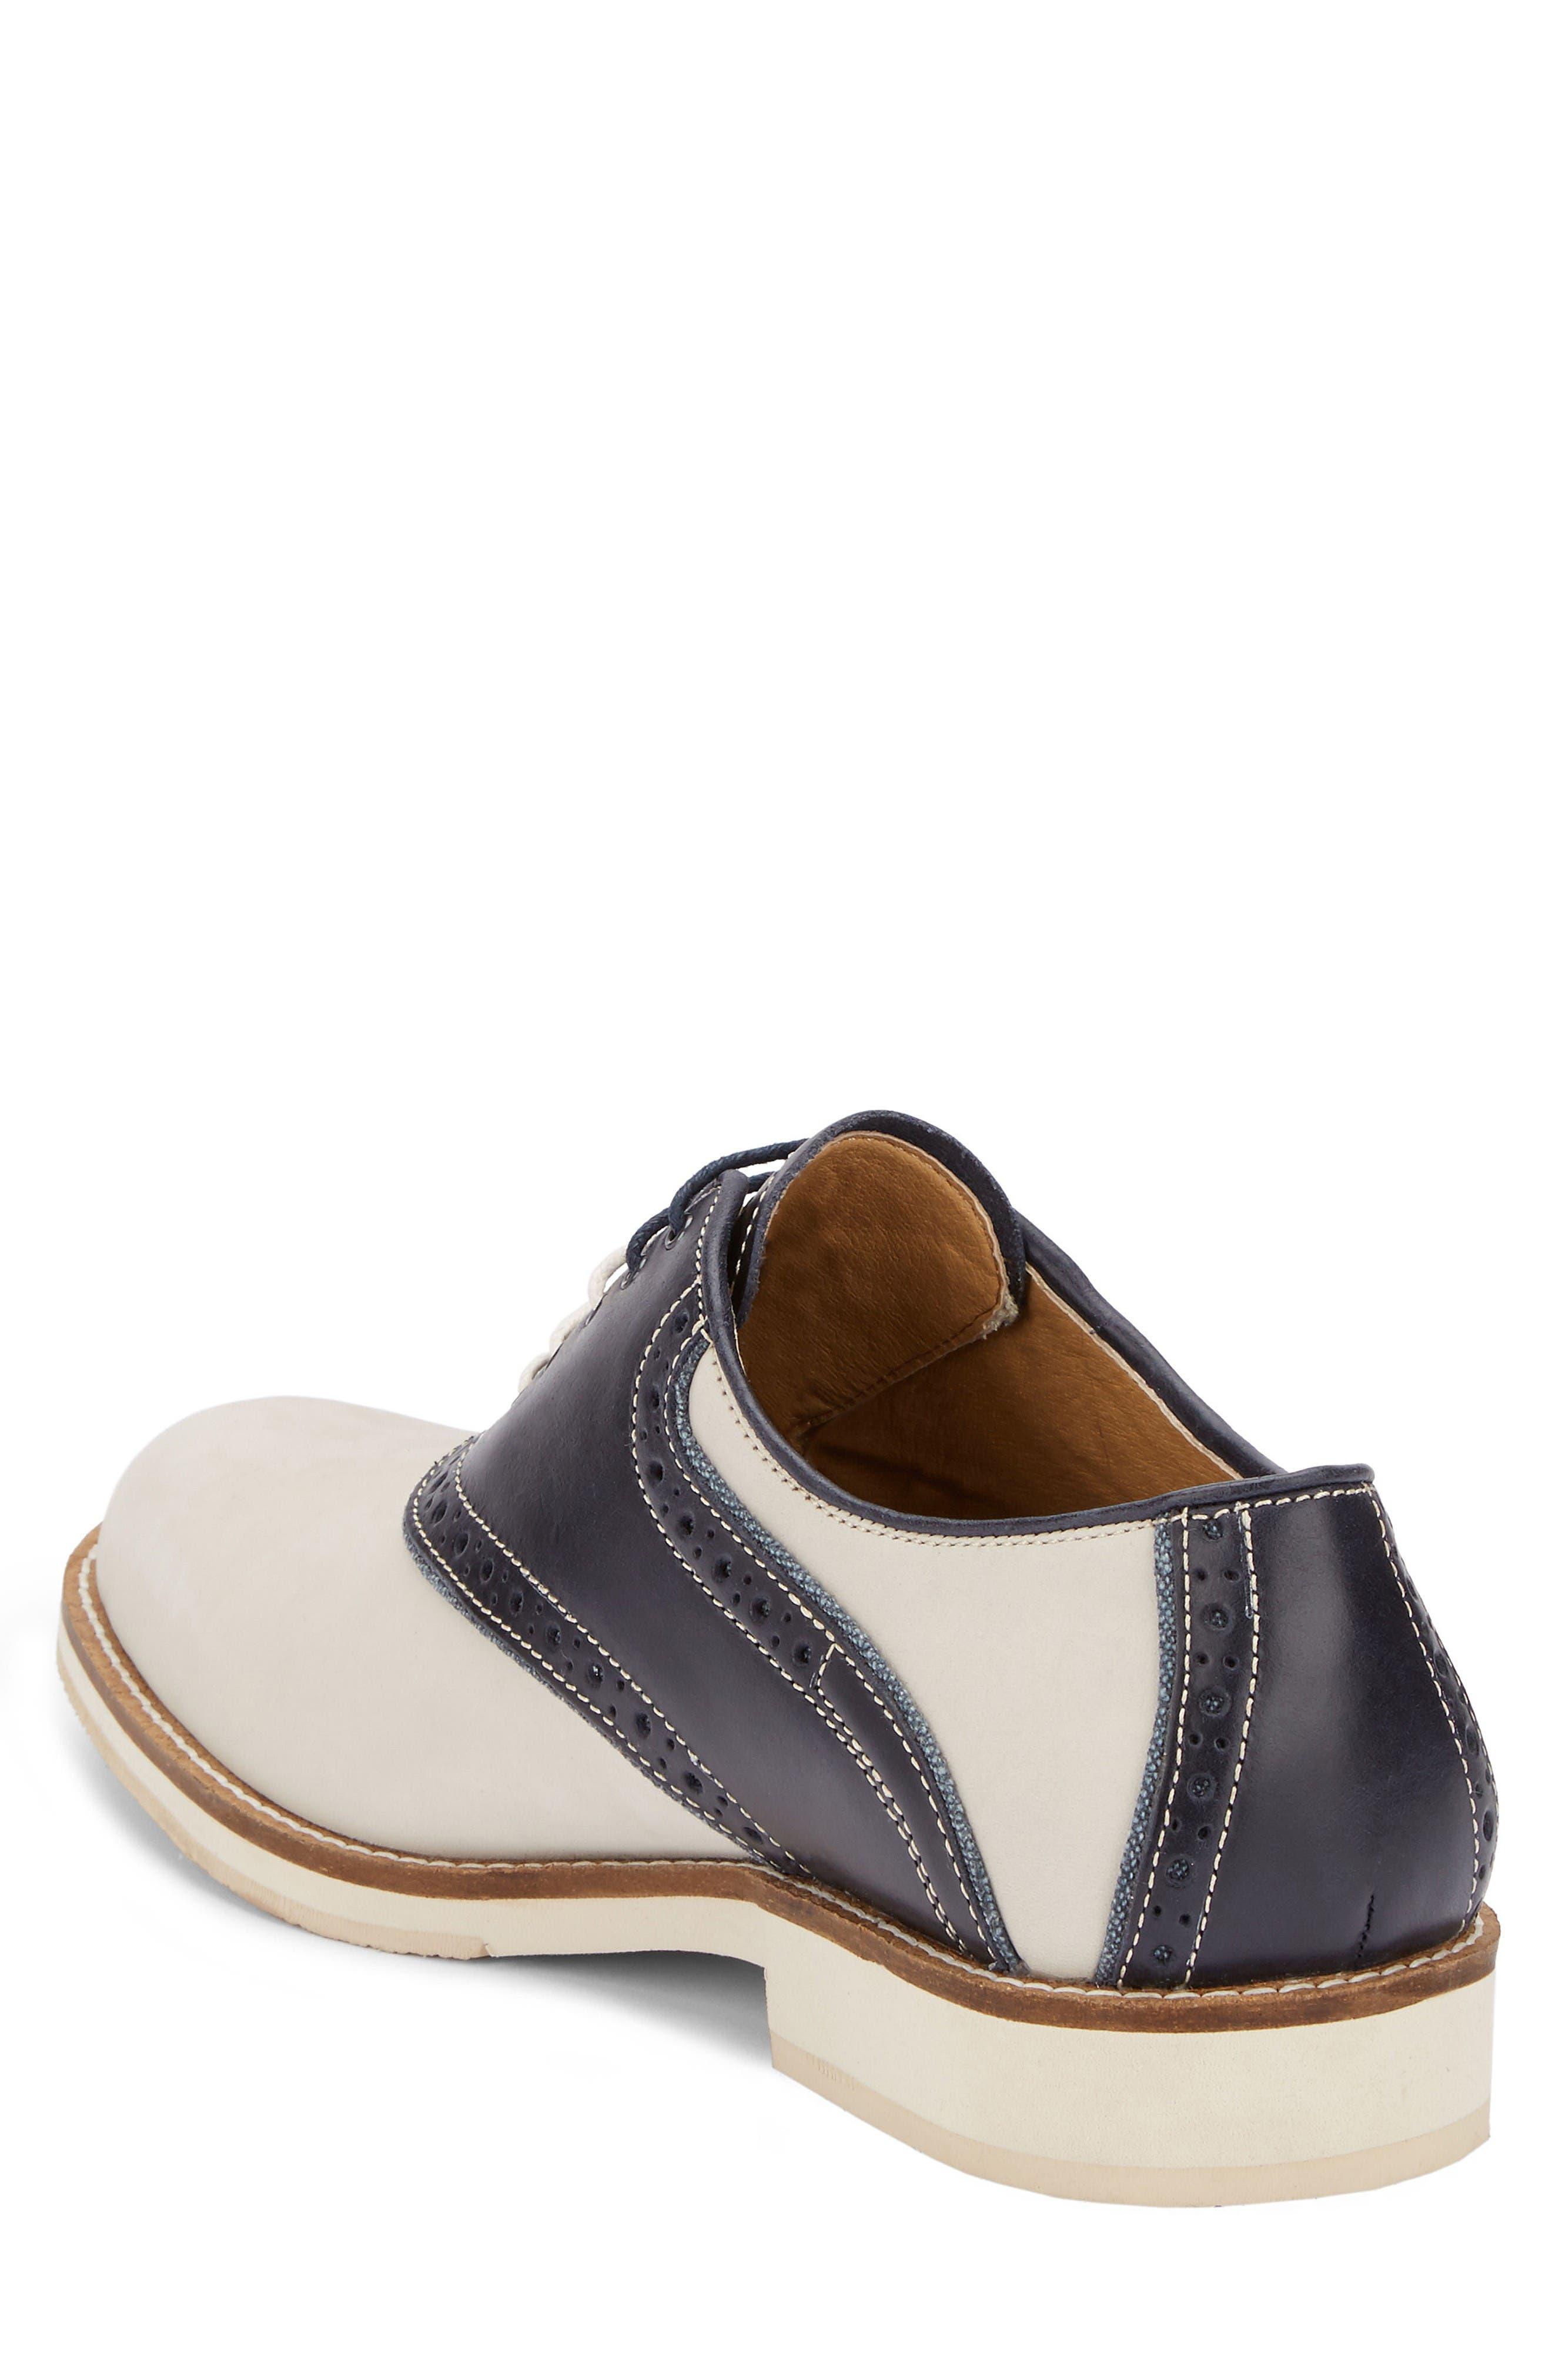 Noah Saddle Shoe,                             Alternate thumbnail 2, color,                             Oyster/ Navy